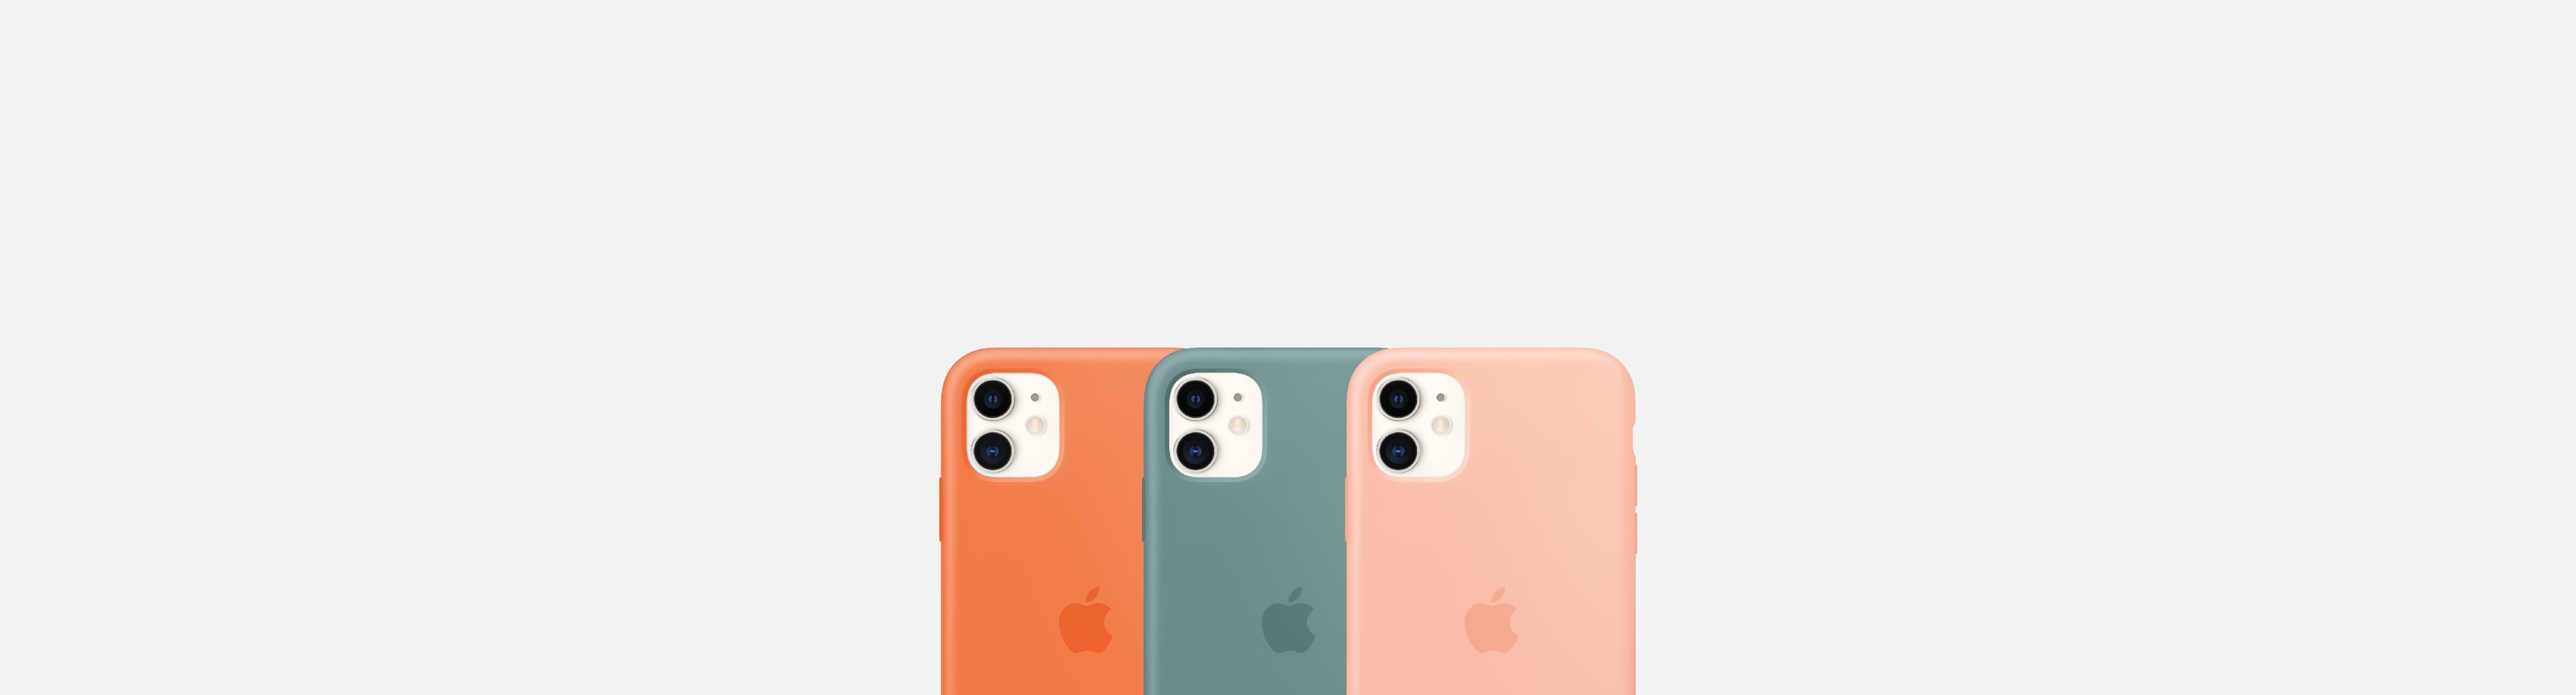 אביזרים - iPhone